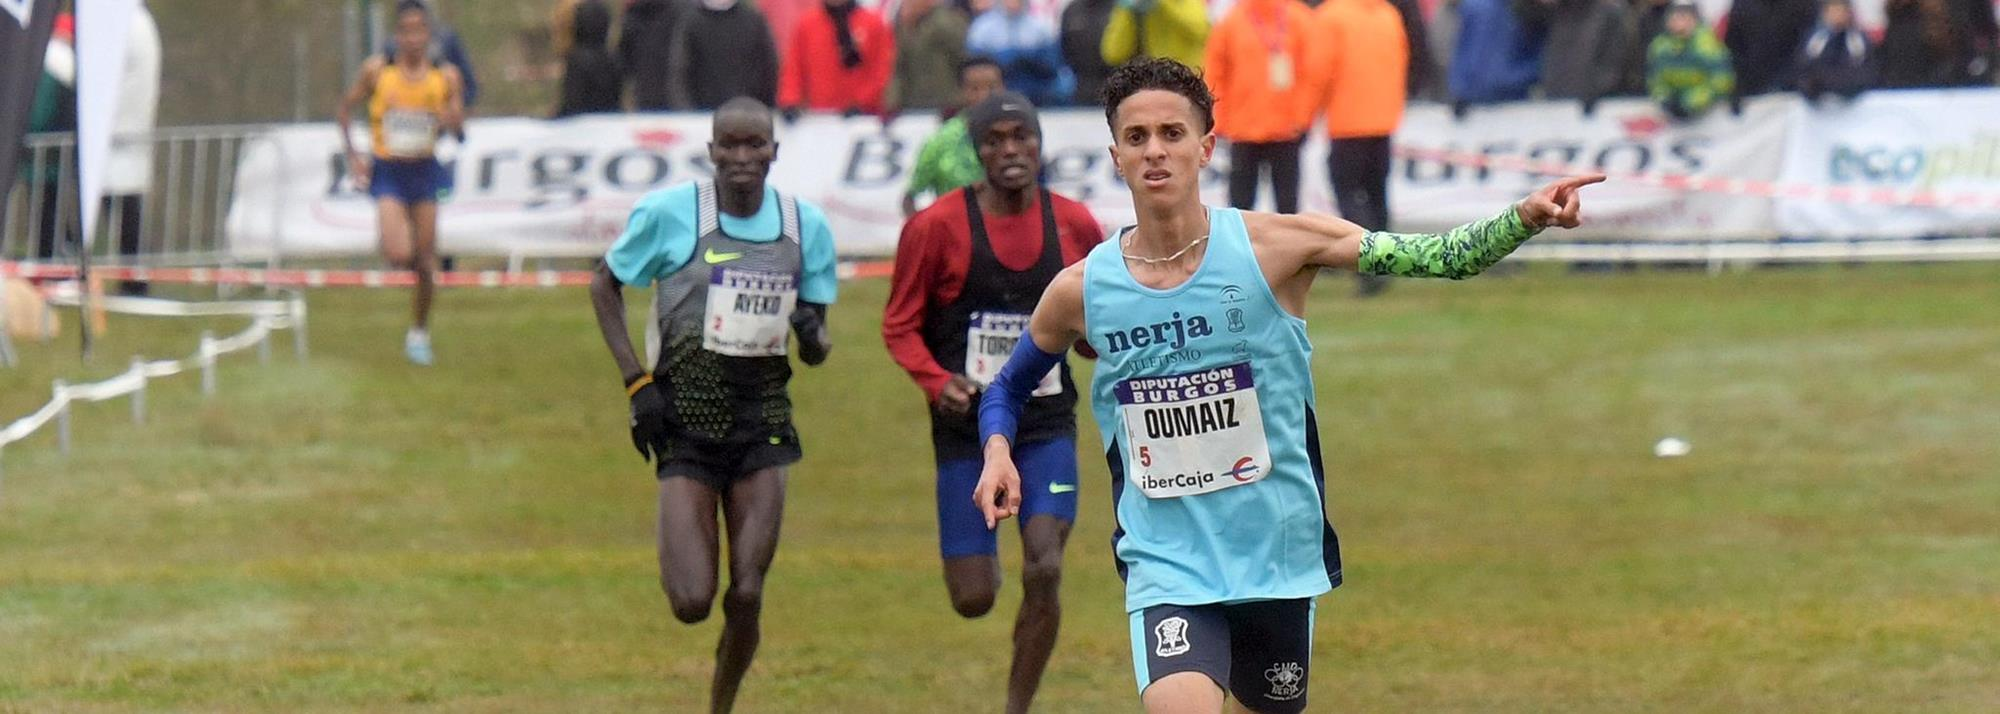 Oumaiz aims to maintain momentum in Soria